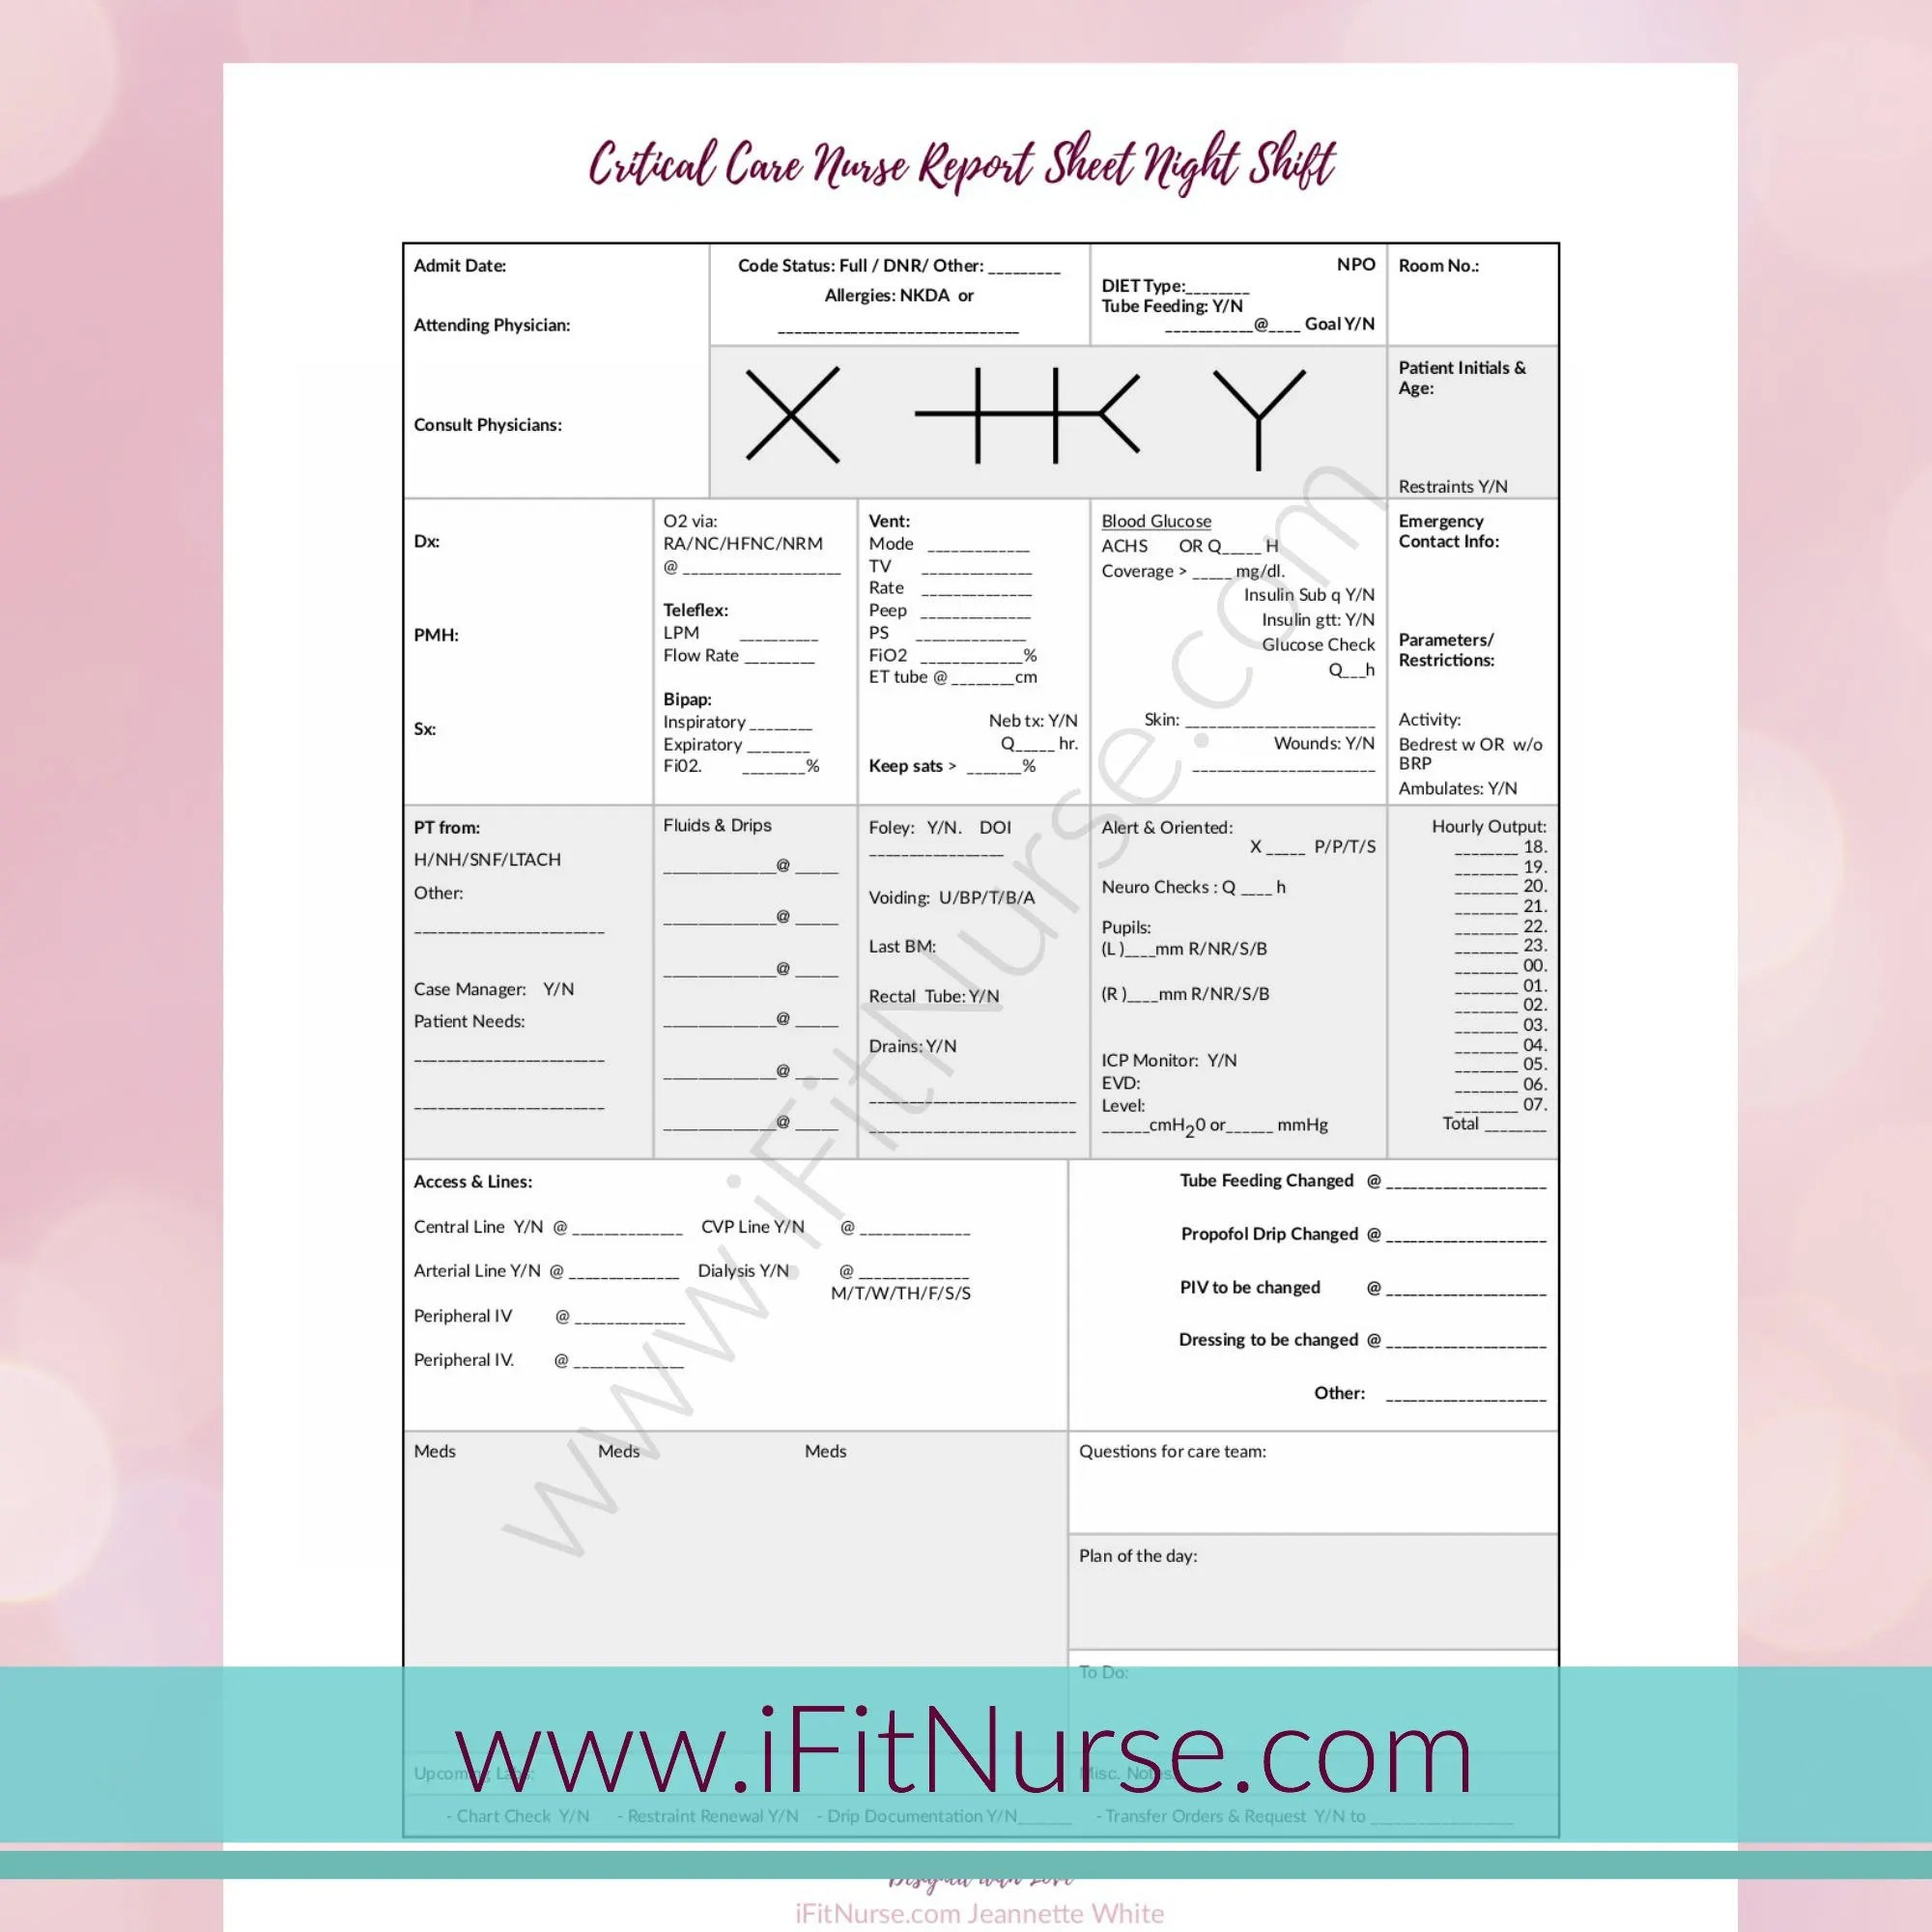 Critical Care Nurse Report Sheet Night Shift V2